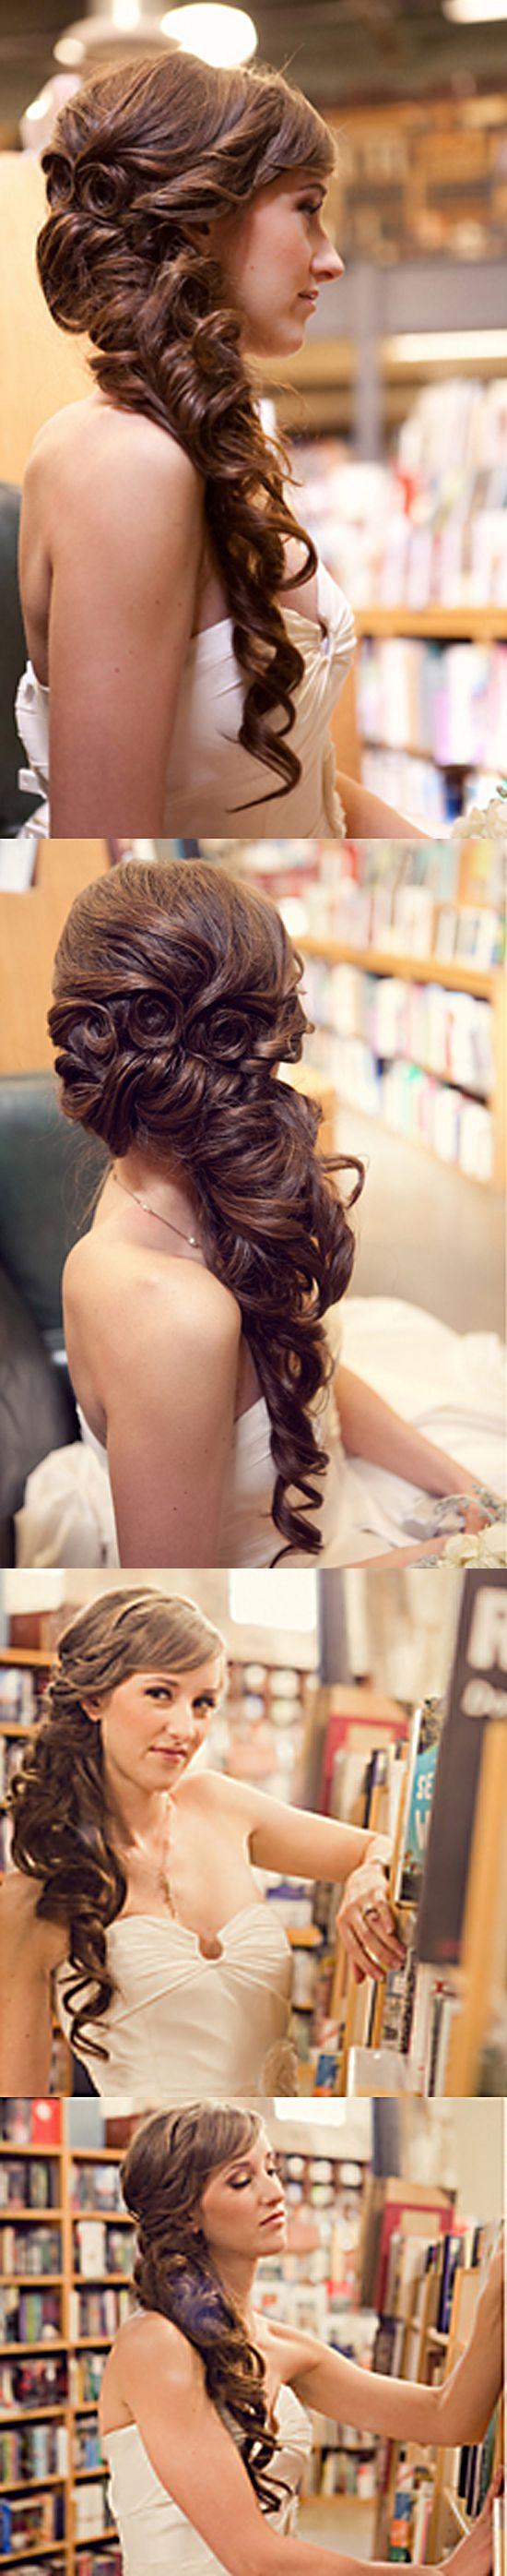 Beautiful rapunzel bridal hair brunette princess belle updo